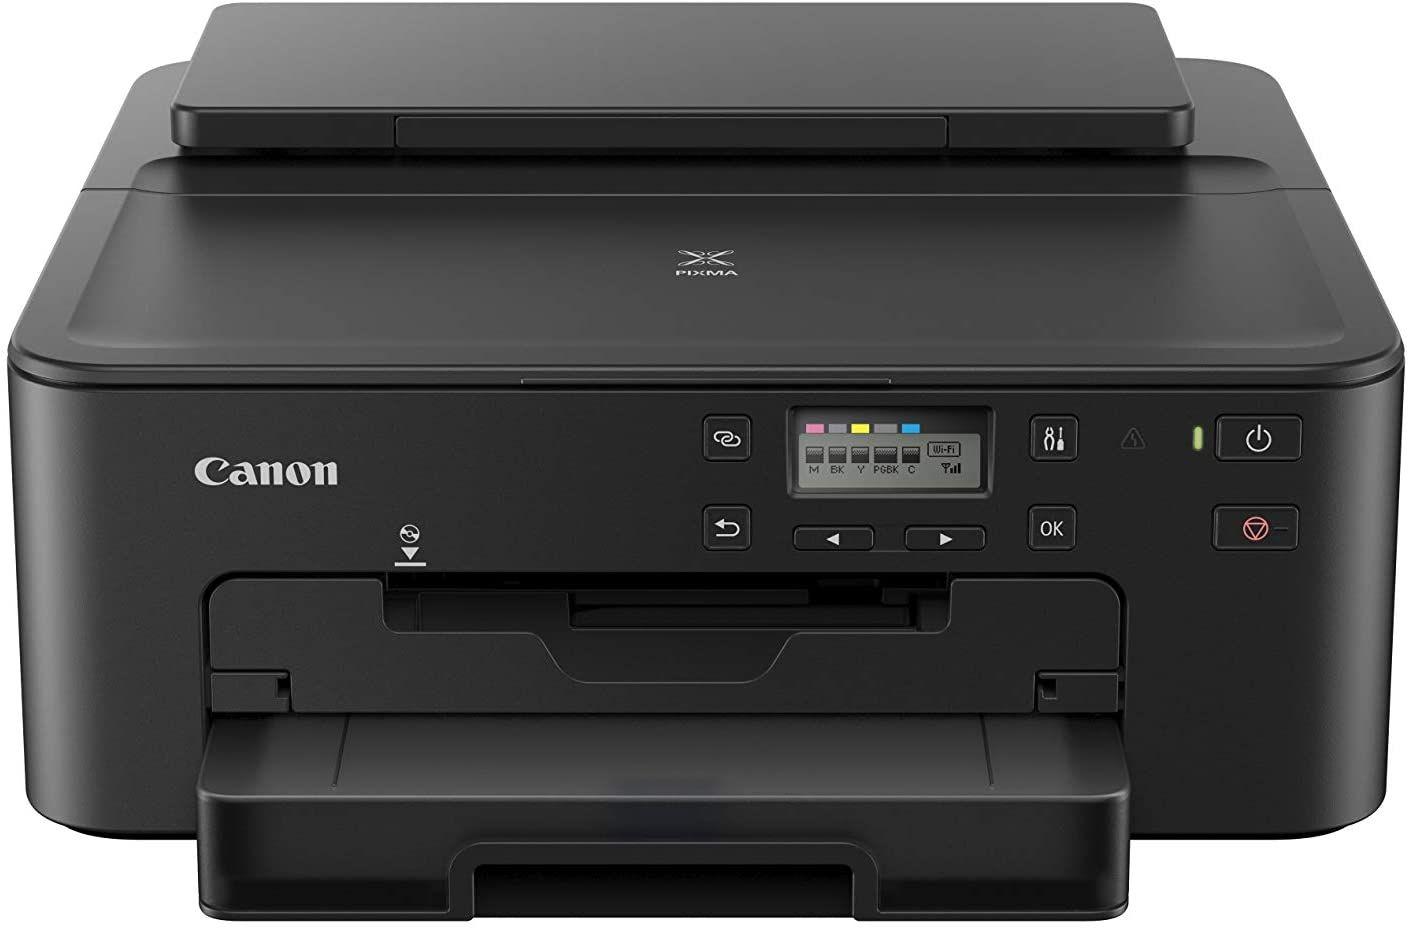 [Amazon Prime] Canon PIXMA TS705 Drucker Tintenstrahl DIN A4 (WLAN, LAN, 5 separate Tinten, automatischer Duplexdruck, 2 Papierzuführungen